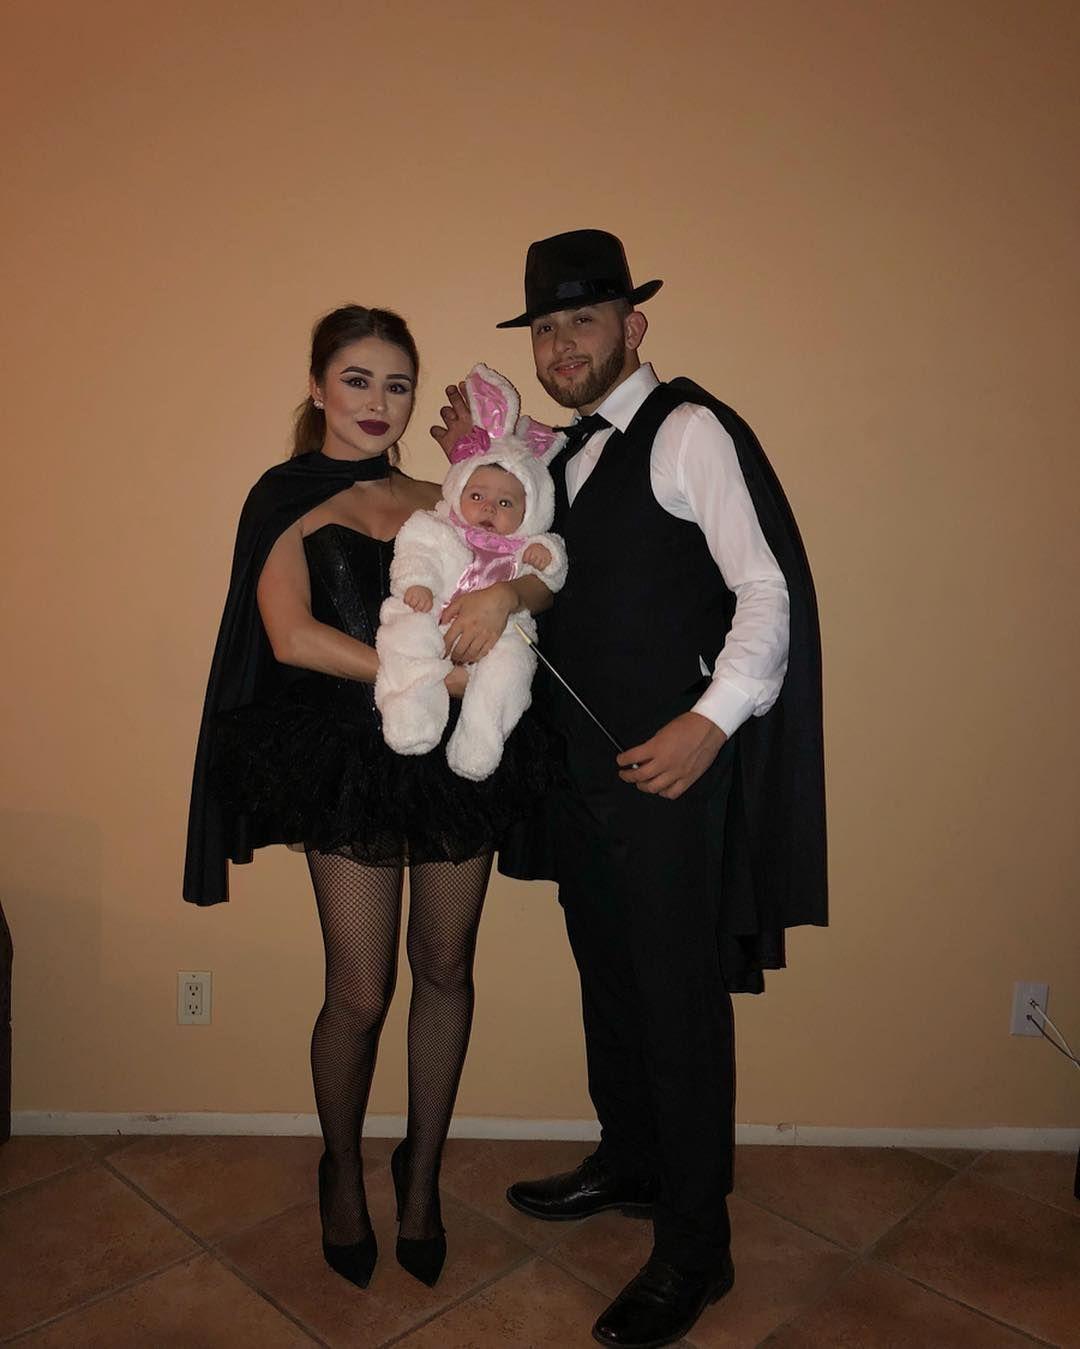 creative family halloween costume ideas that you havenut seen yet